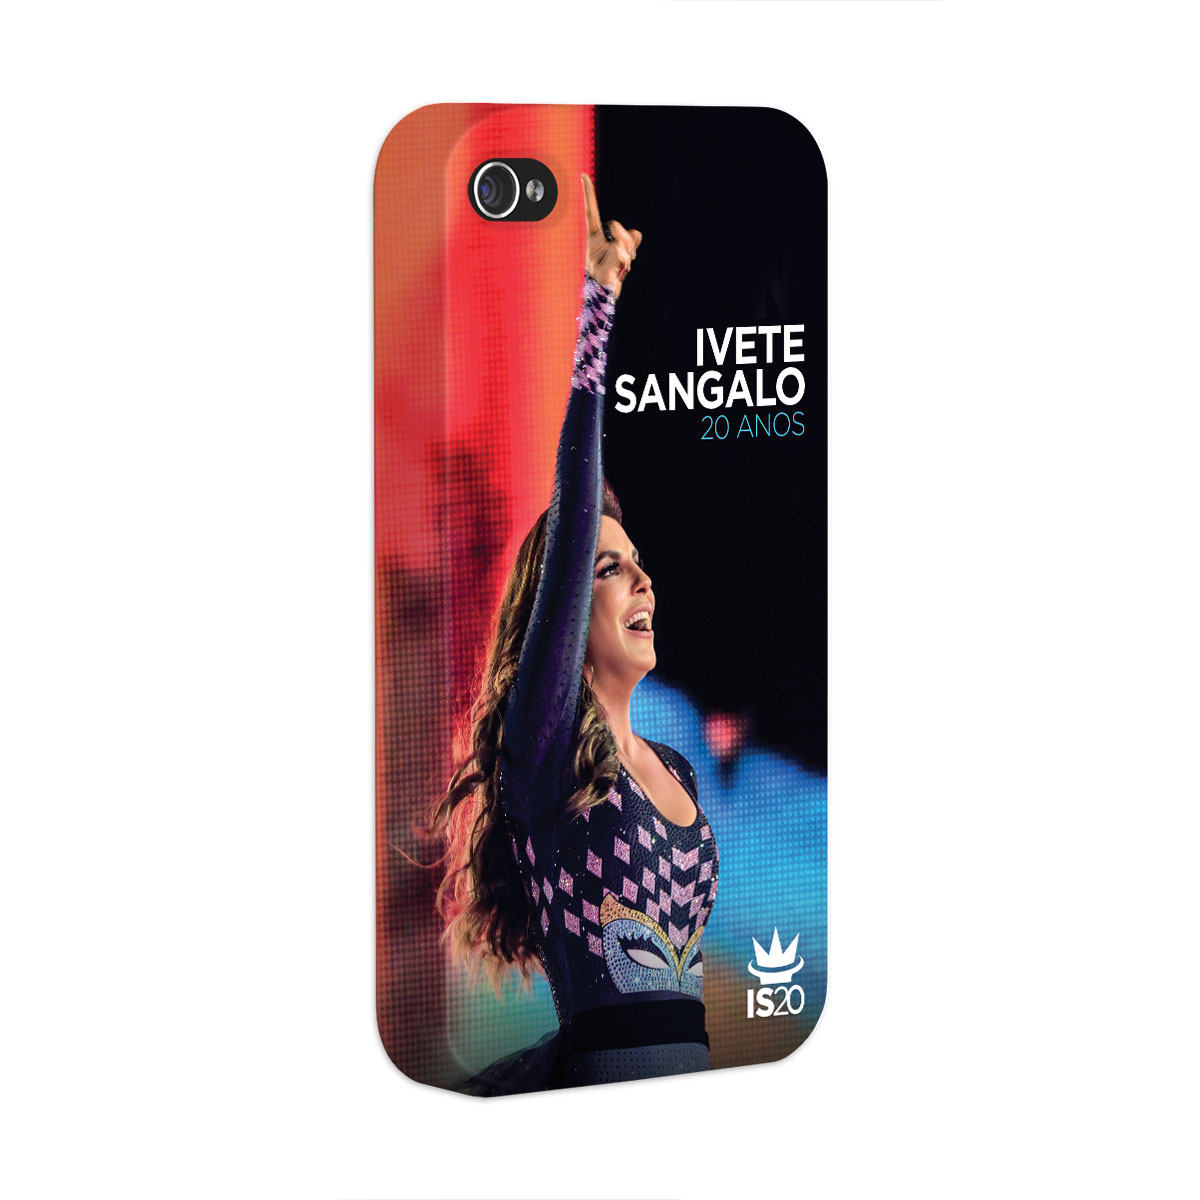 Capa para iPhone 4/4S Ivete Sangalo Capa 20 Anos